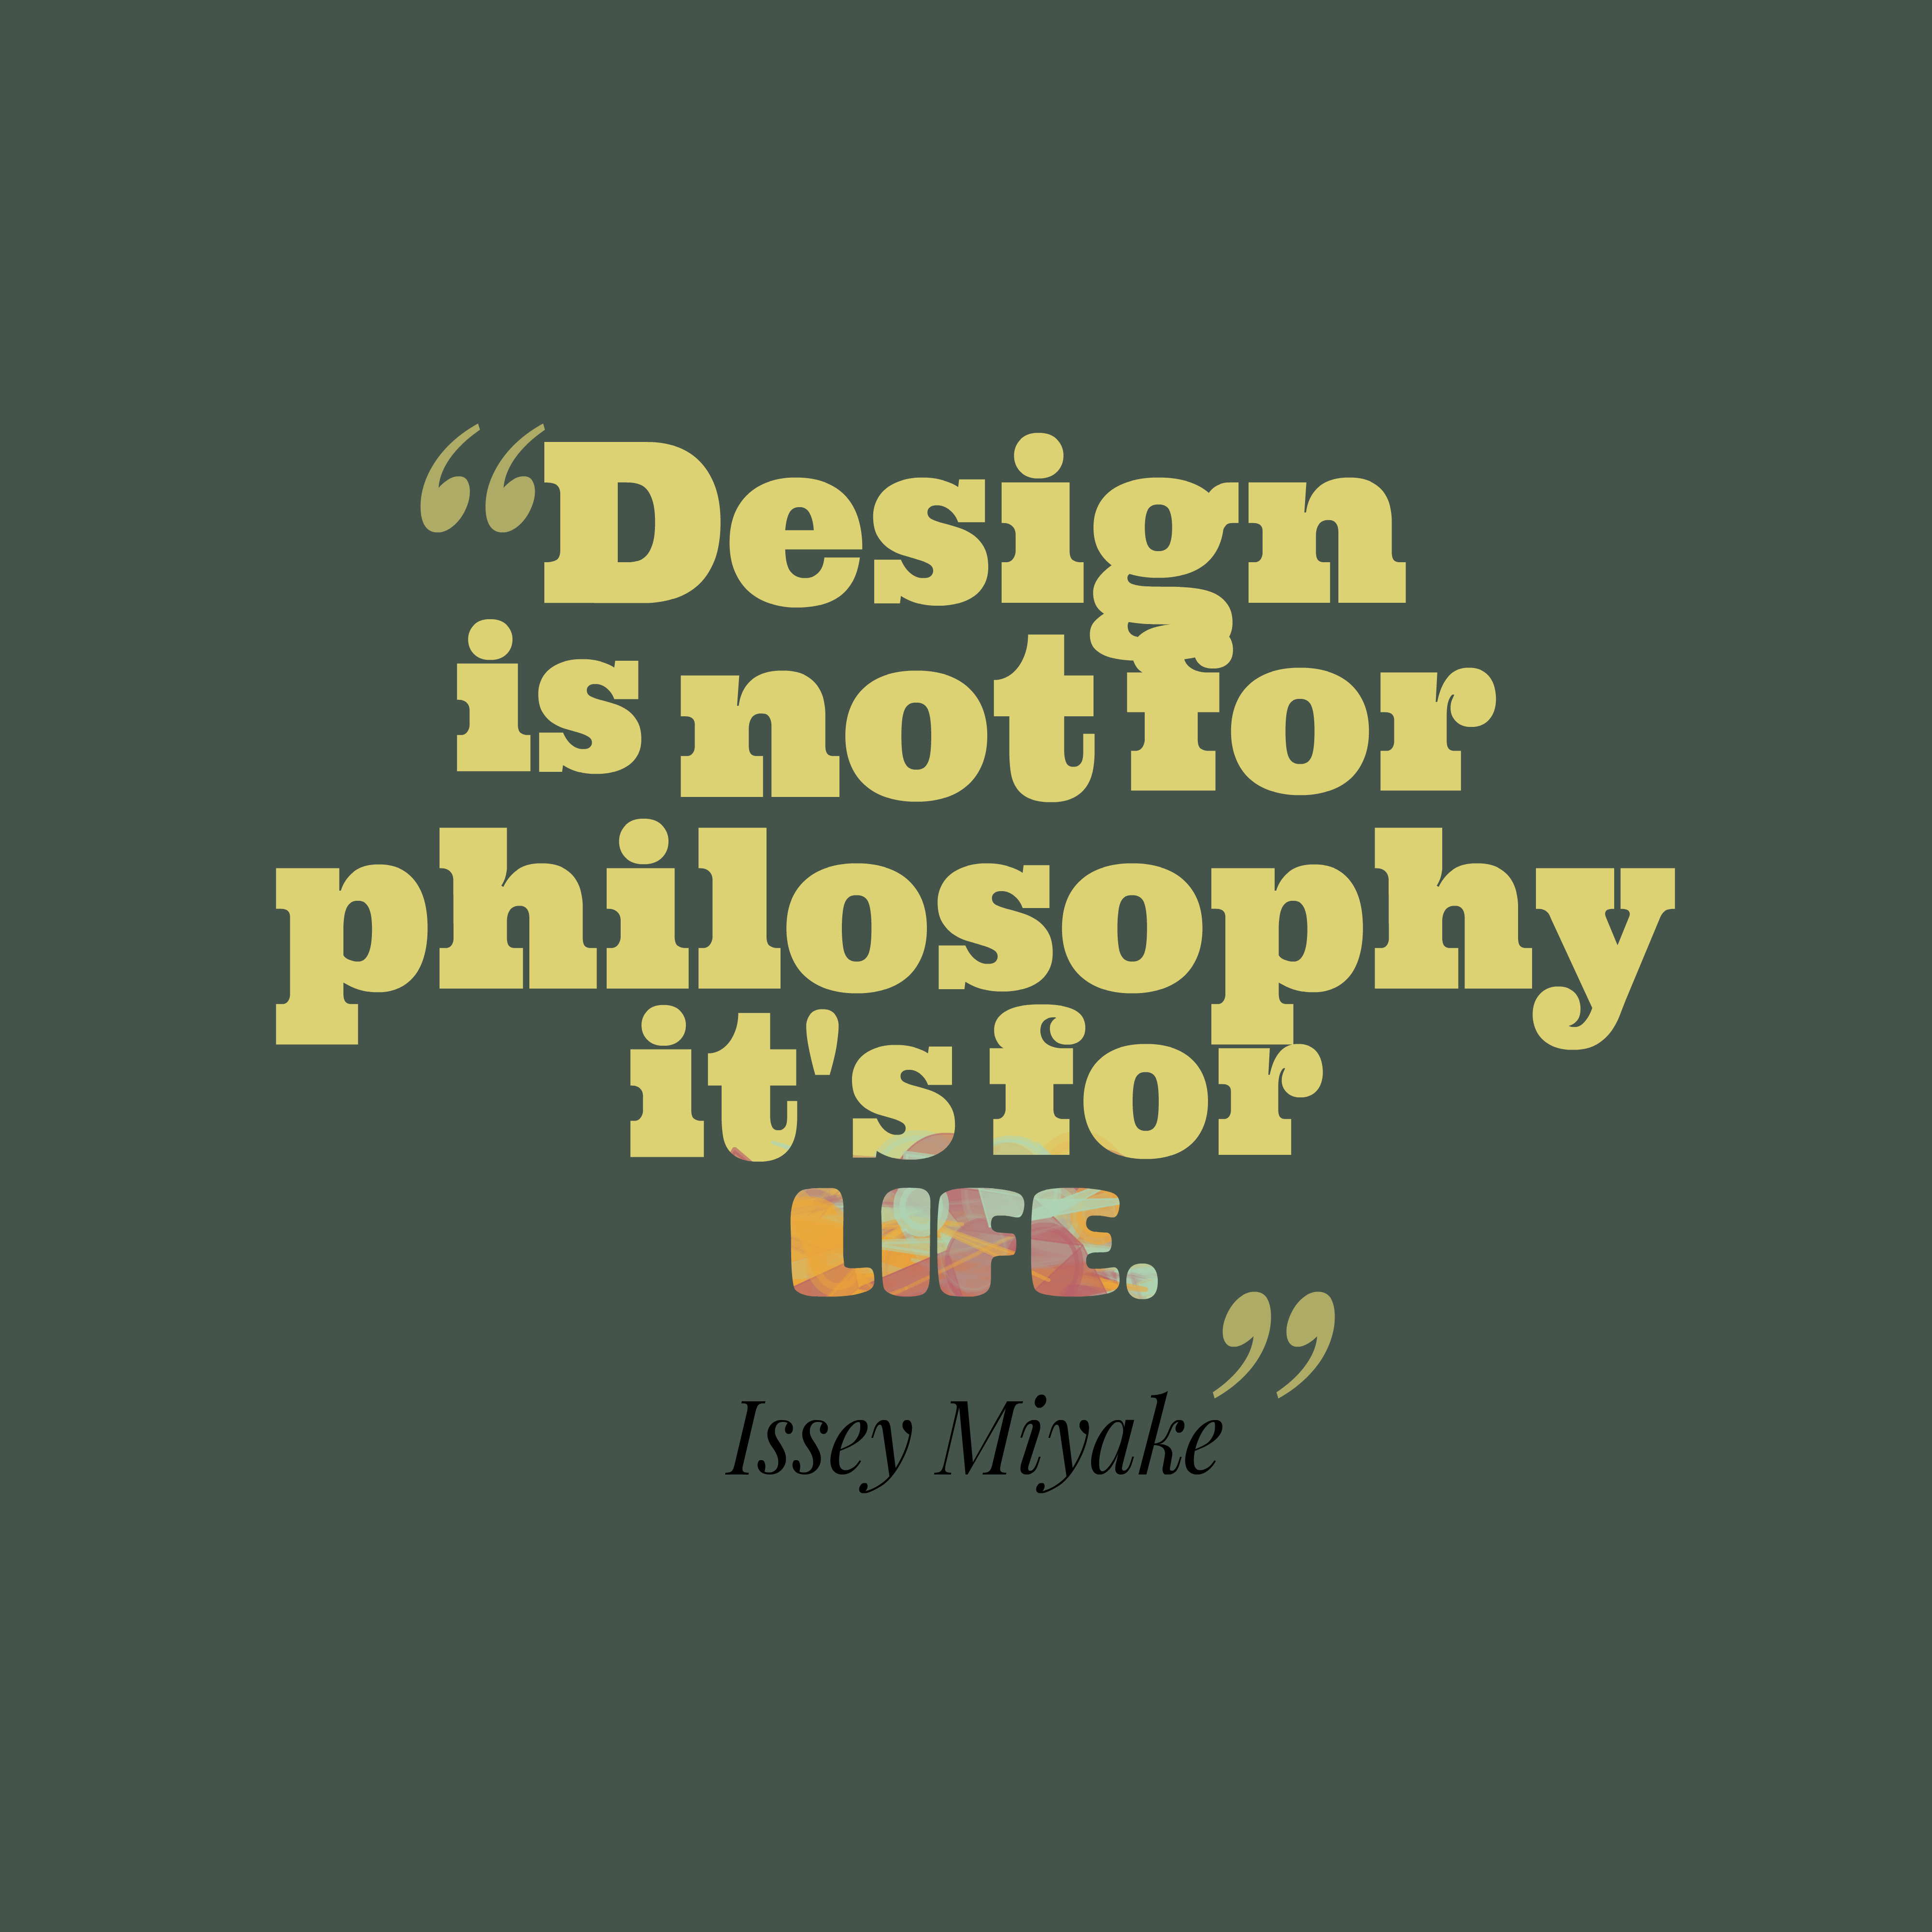 Inspirational Design Posters - Sam Baynham Graphic Design